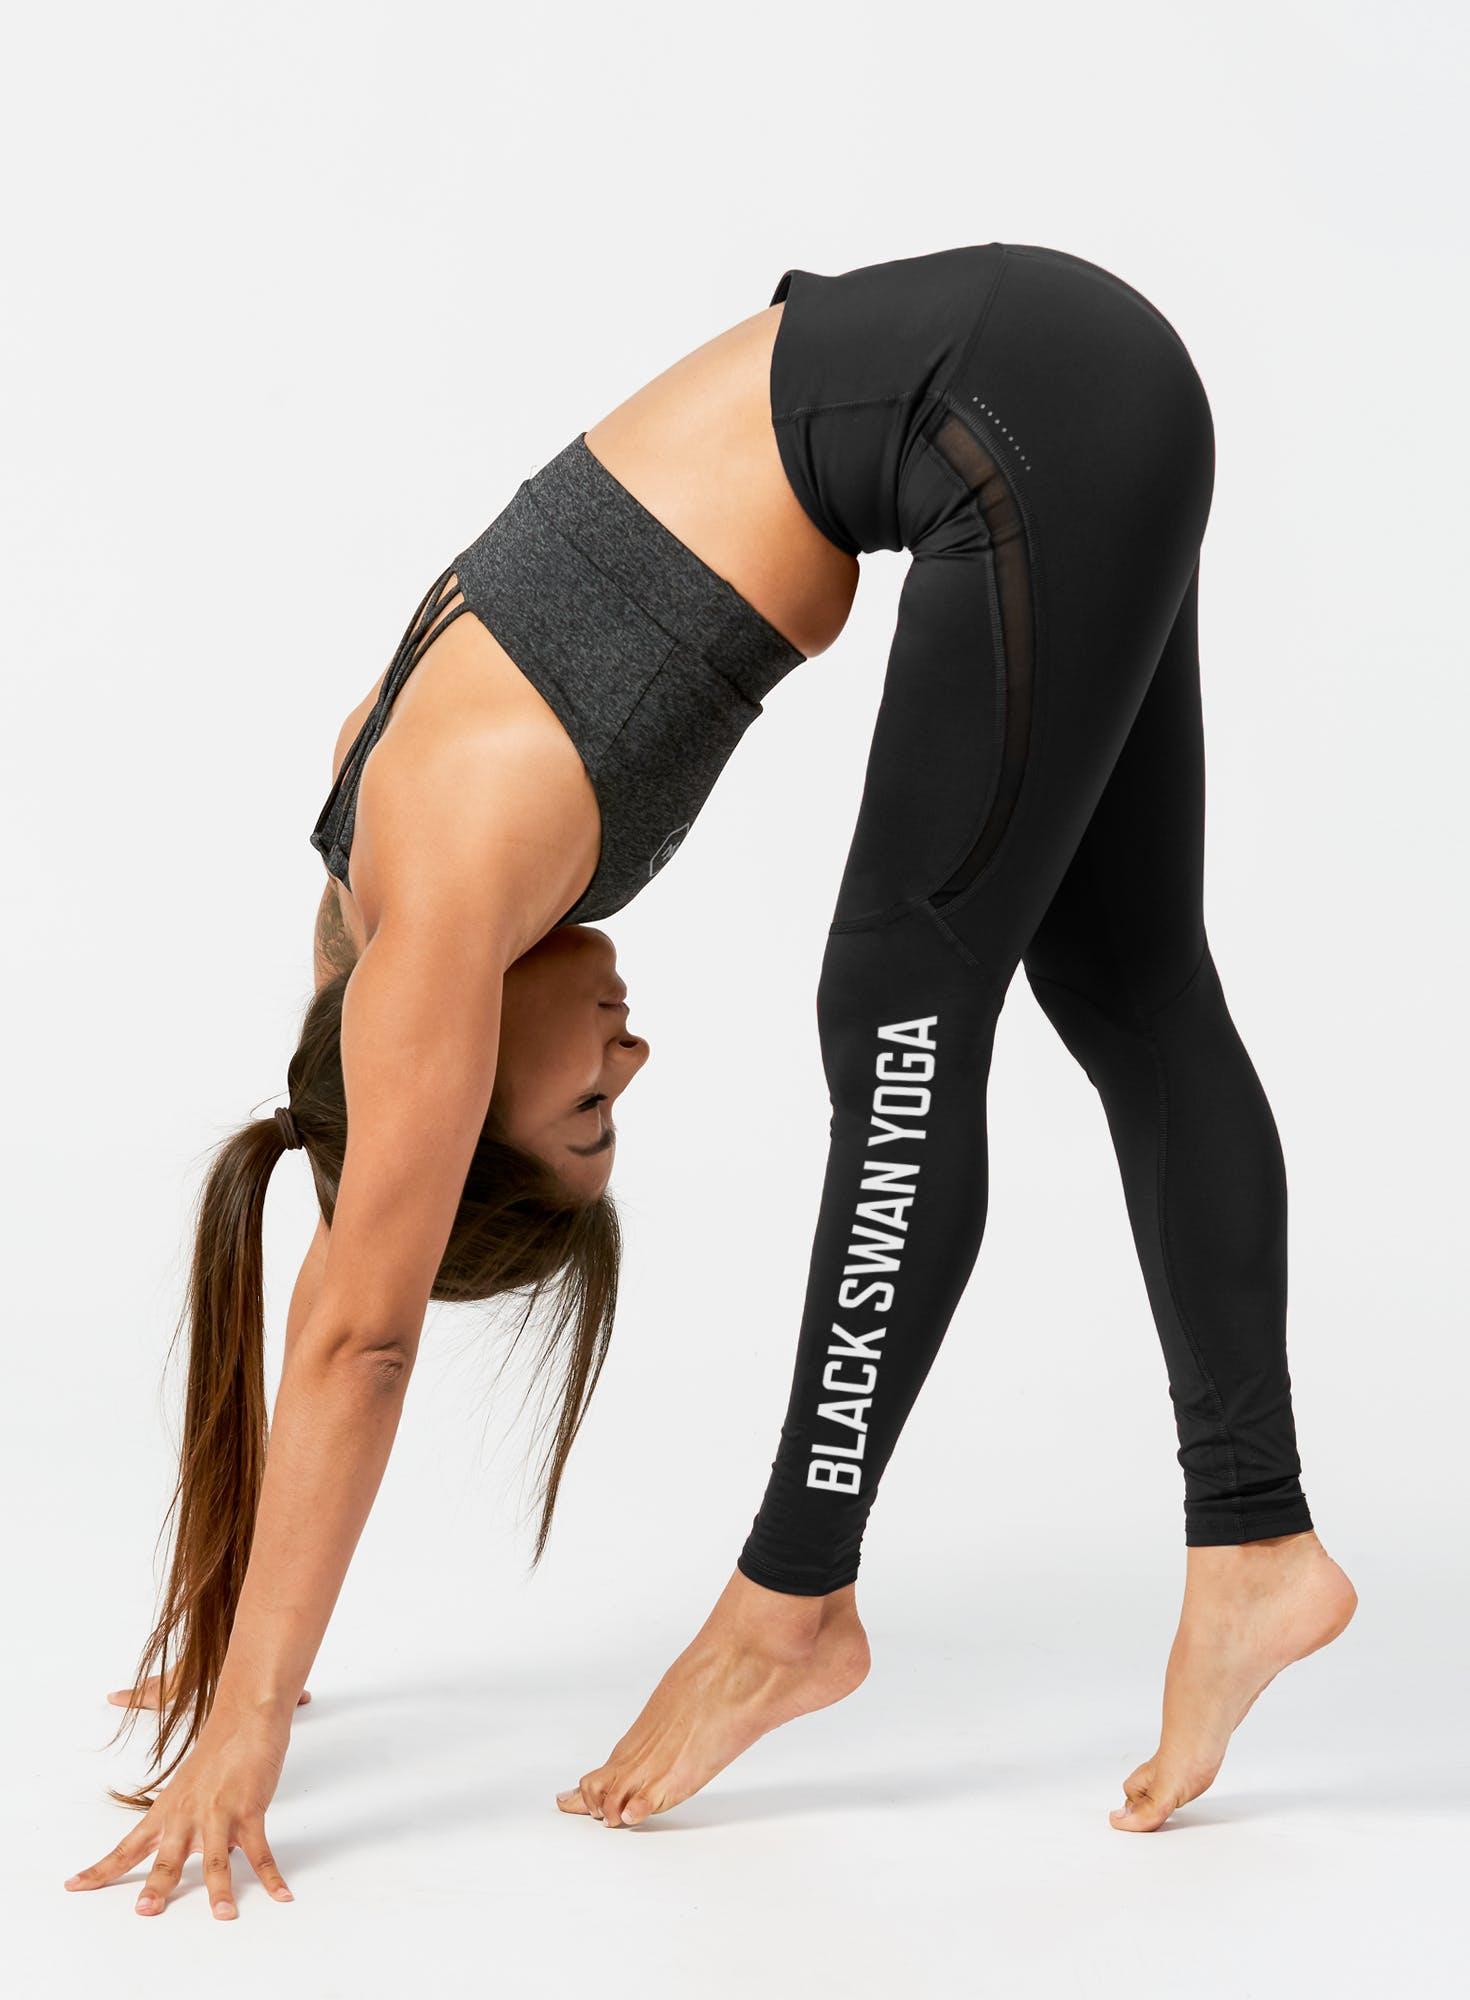 BSY Hi-Waist Performance Legging Bonus Image